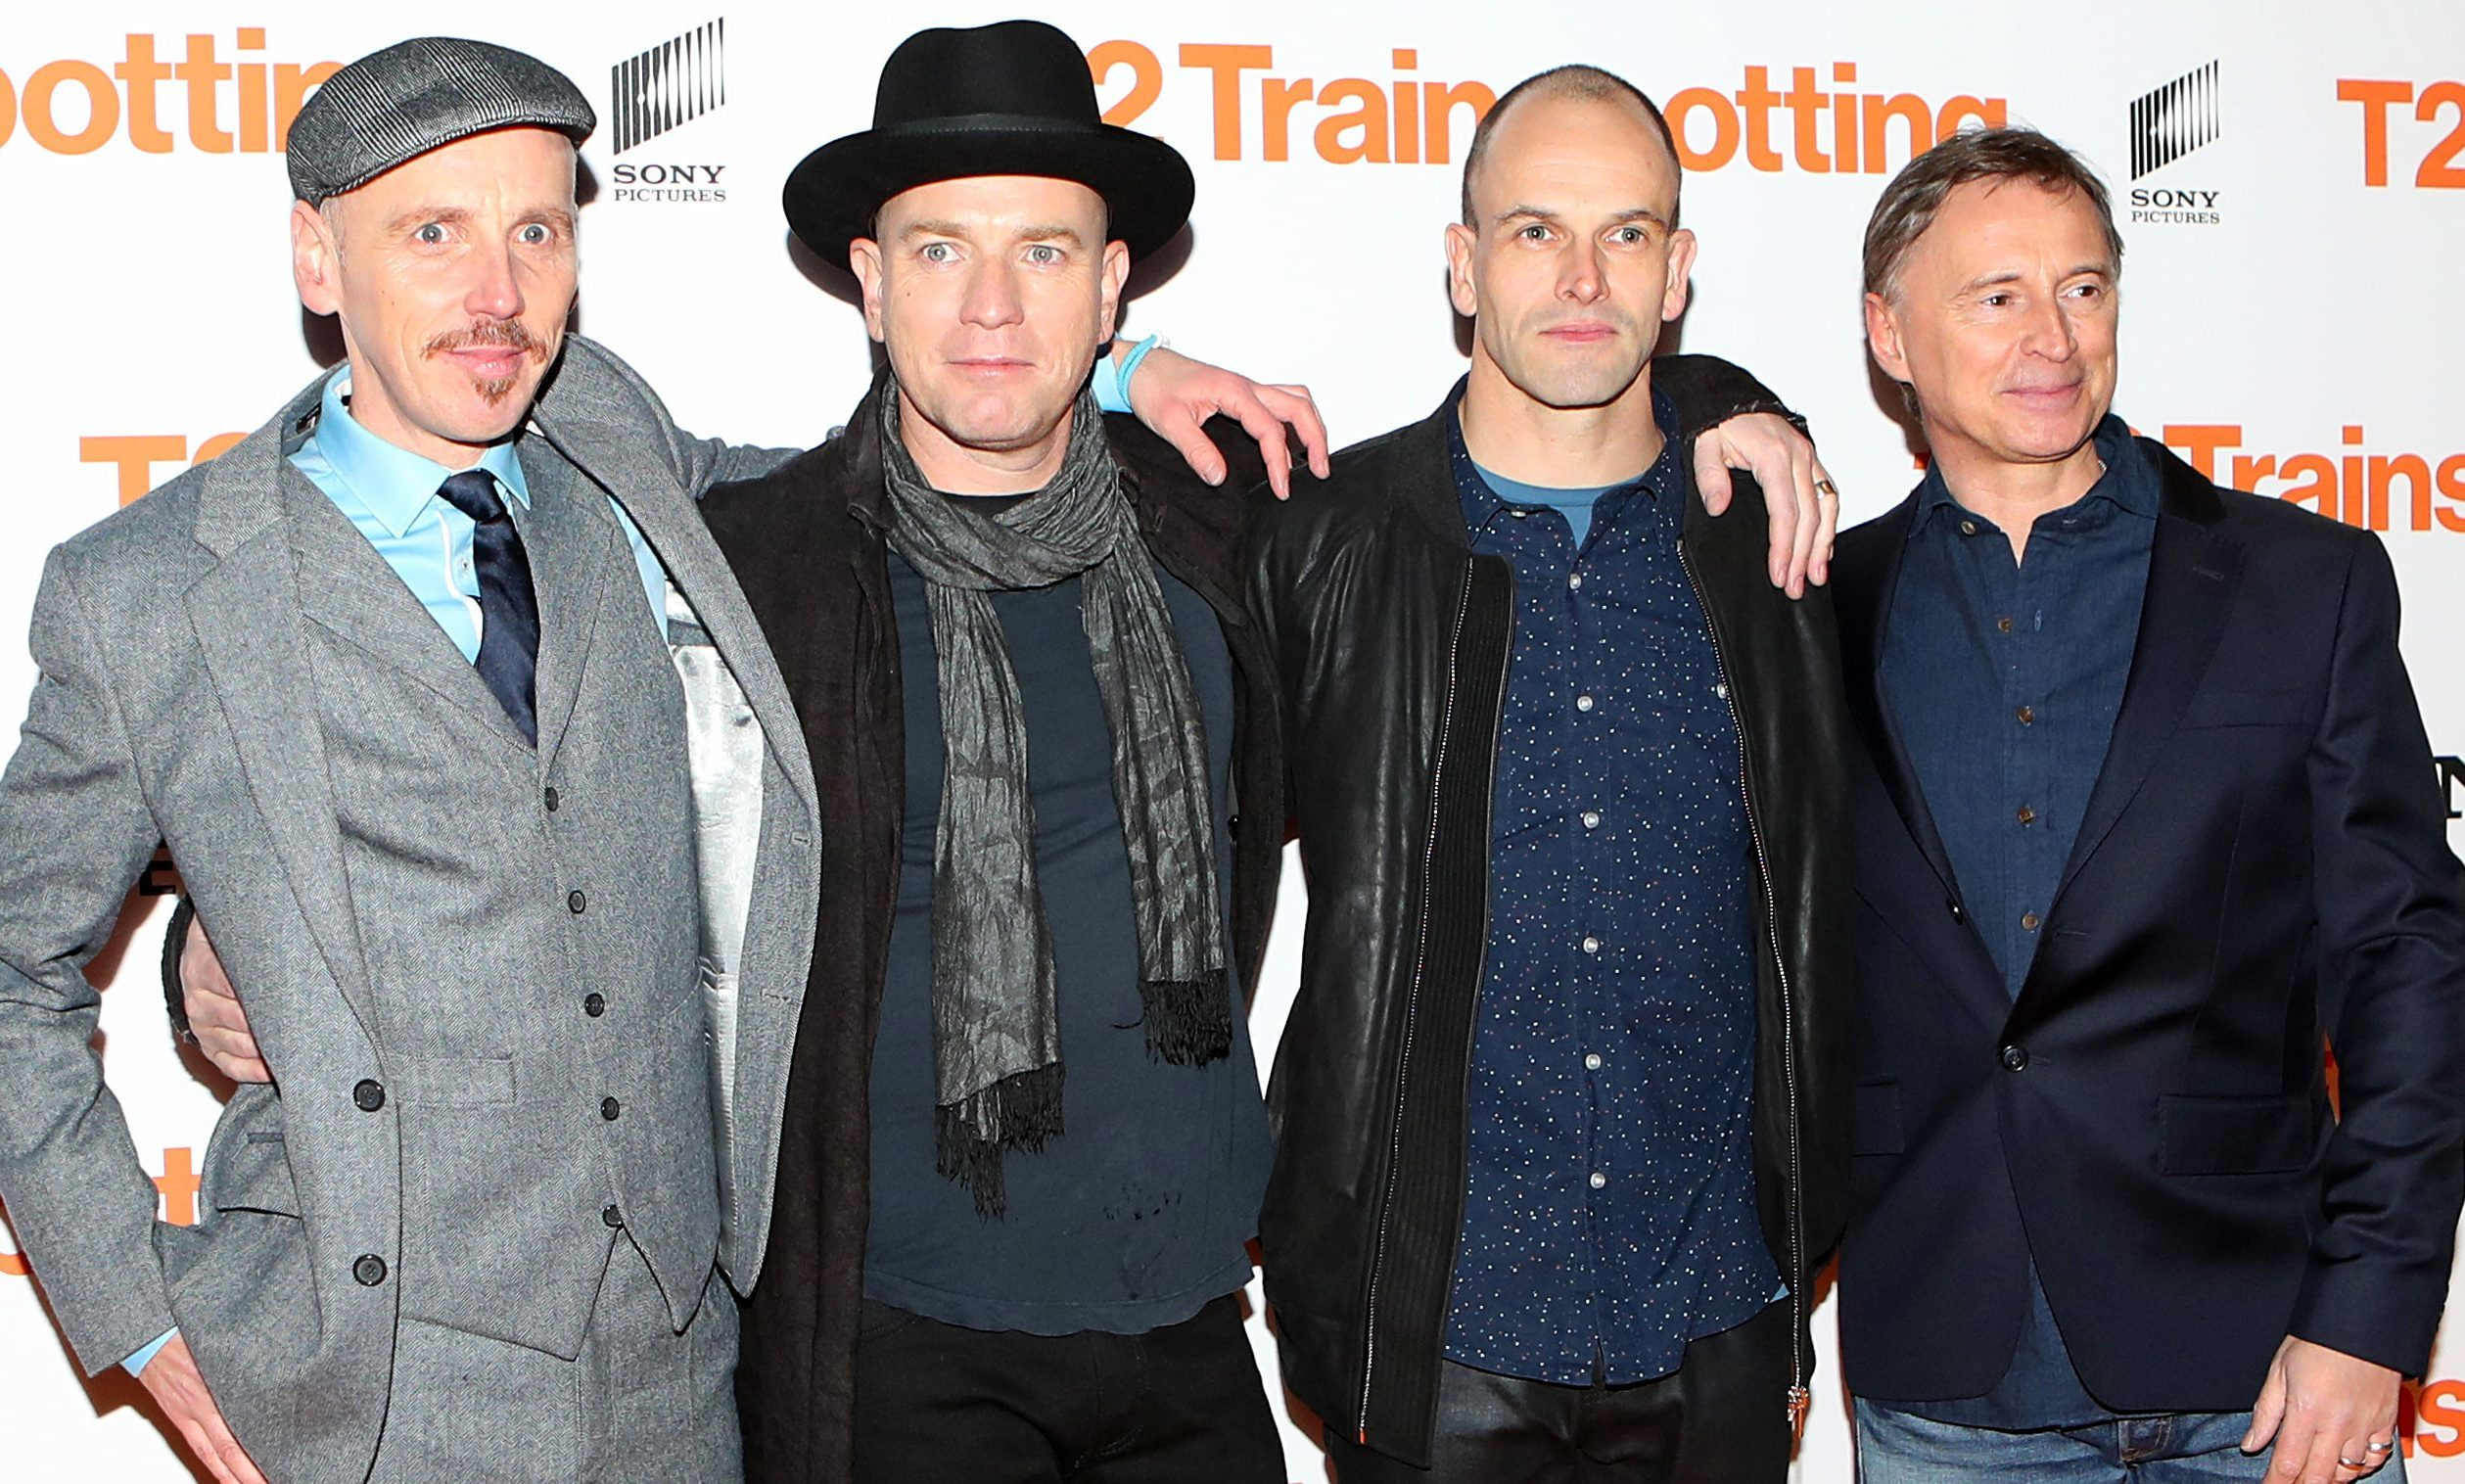 Ewen Bremner, Ewan McGregor, Jonny Lee Miller and Robert Carlyle at the world premiere of Trainspotting 2 at Cineworld in Edinburgh.